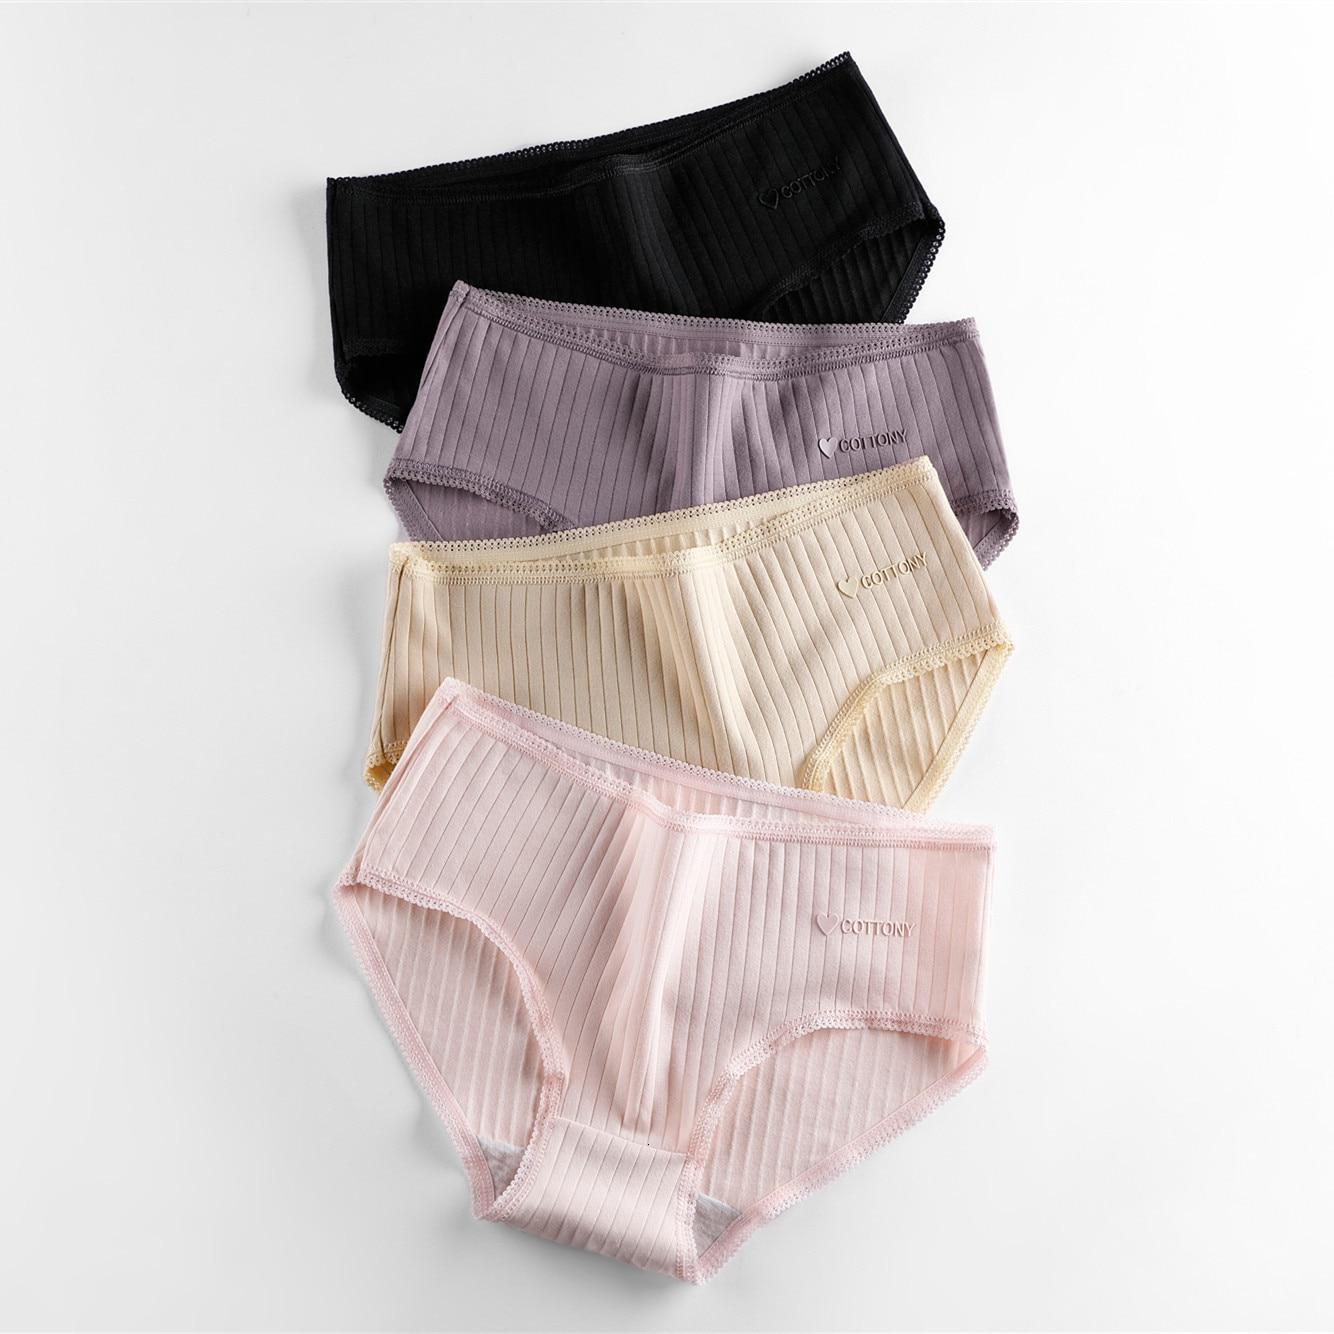 M-XL Women's Panties 3Pcs Cotton Solid Color Girl Briefs Sexy Lingerie Female Underwear Ladies Underpants Women Intimate 2019